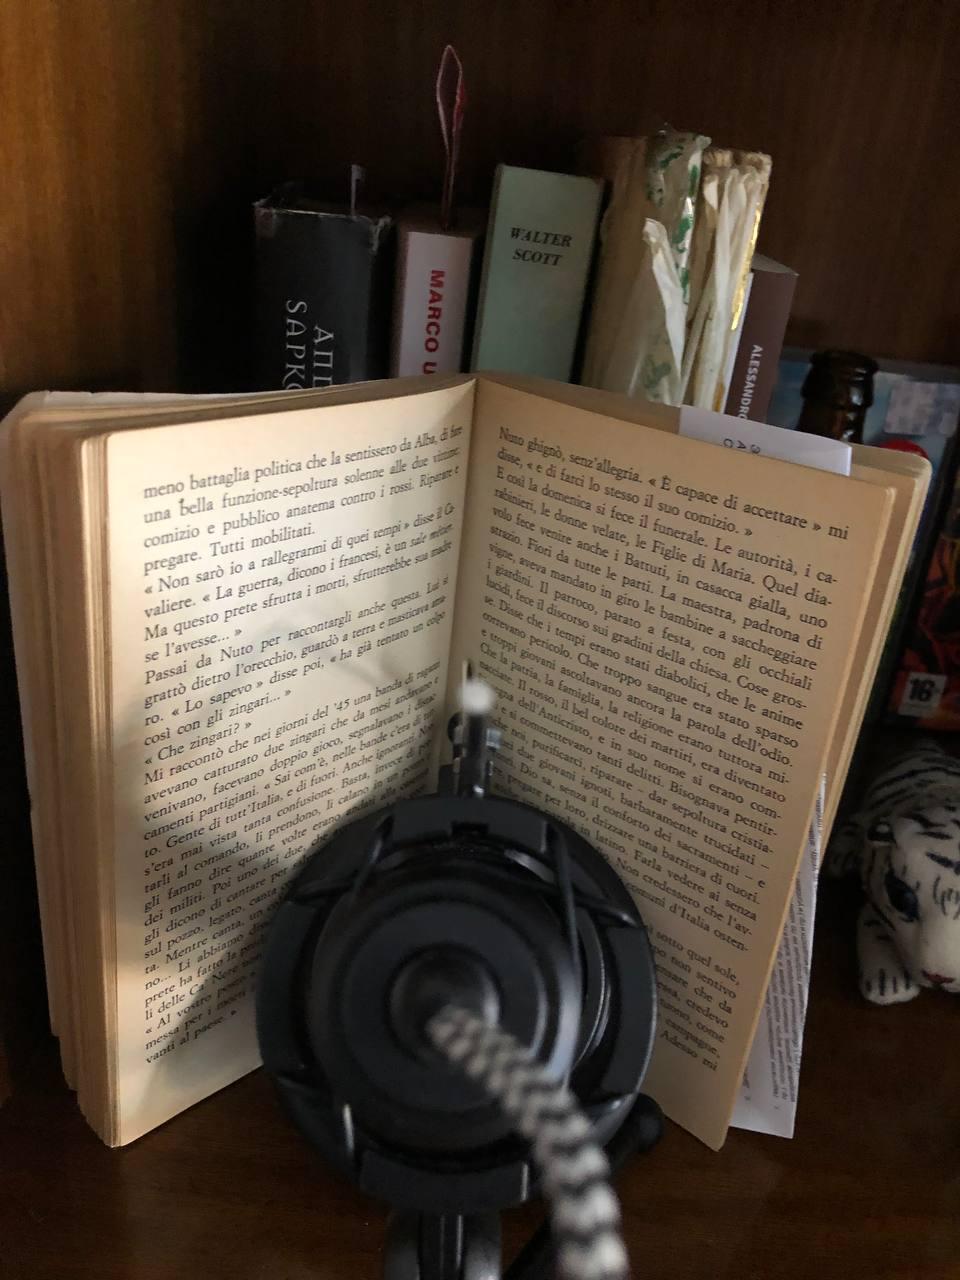 "#Podcast:"" #LaLunaeifalò"" capitoli12-13-14."